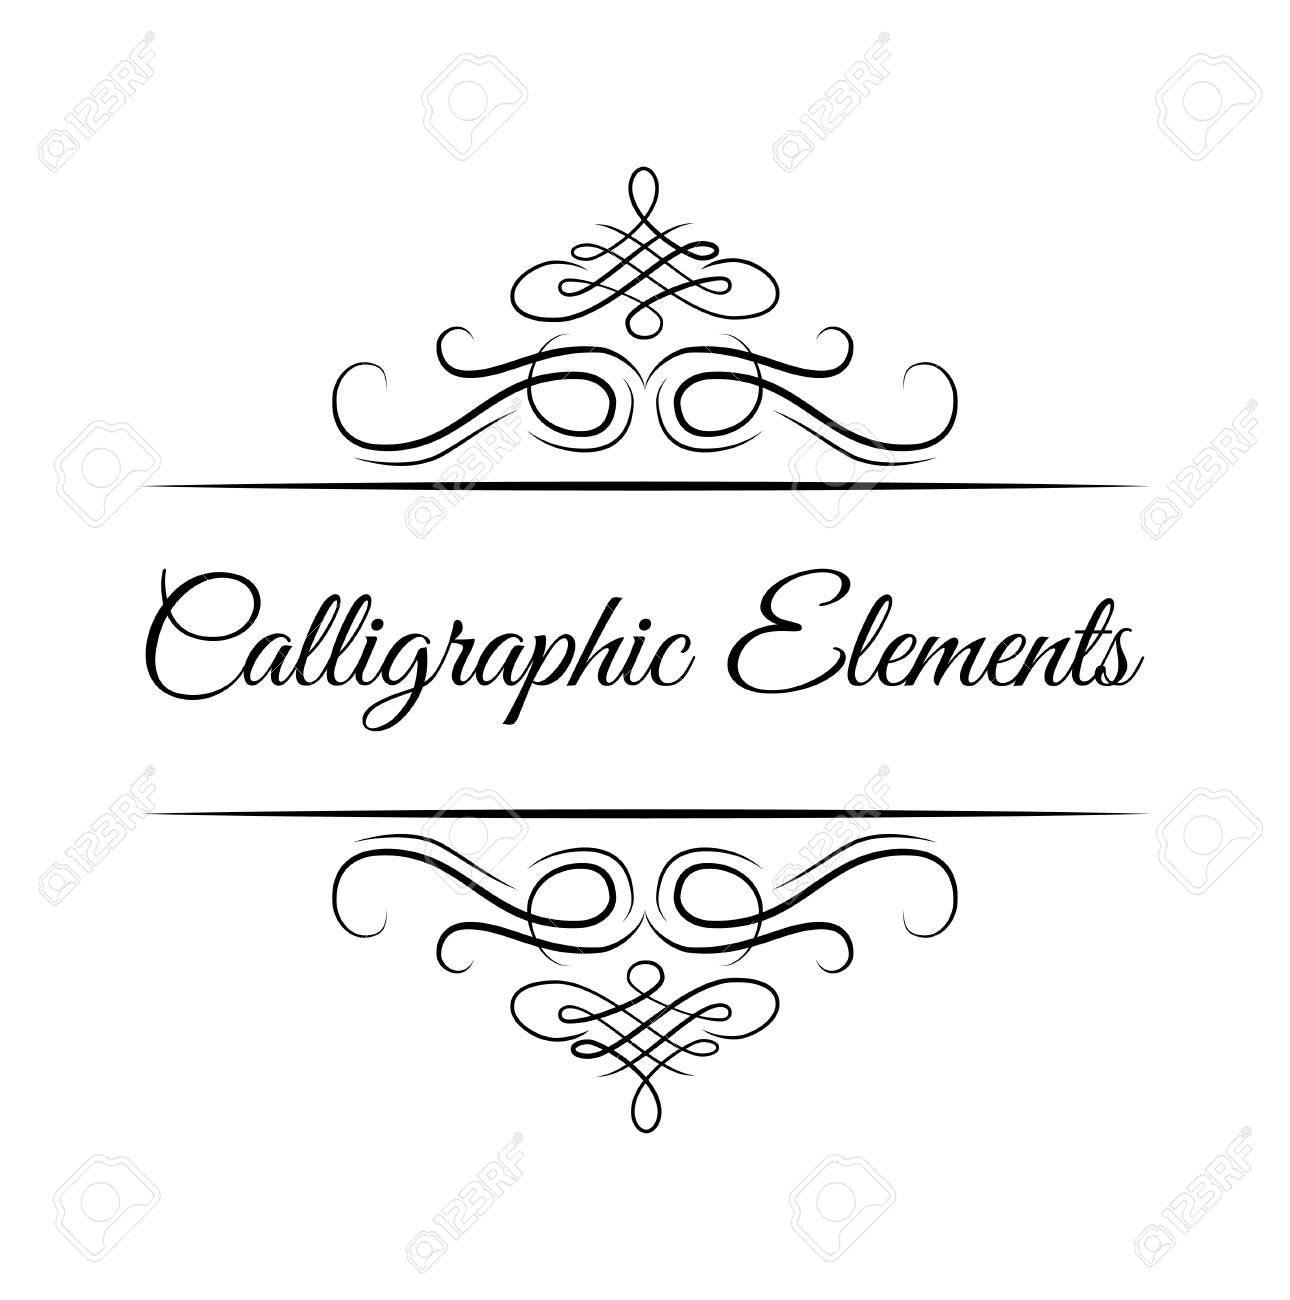 Calligraphic Design Elements Decorative Swirls Or Scrolls